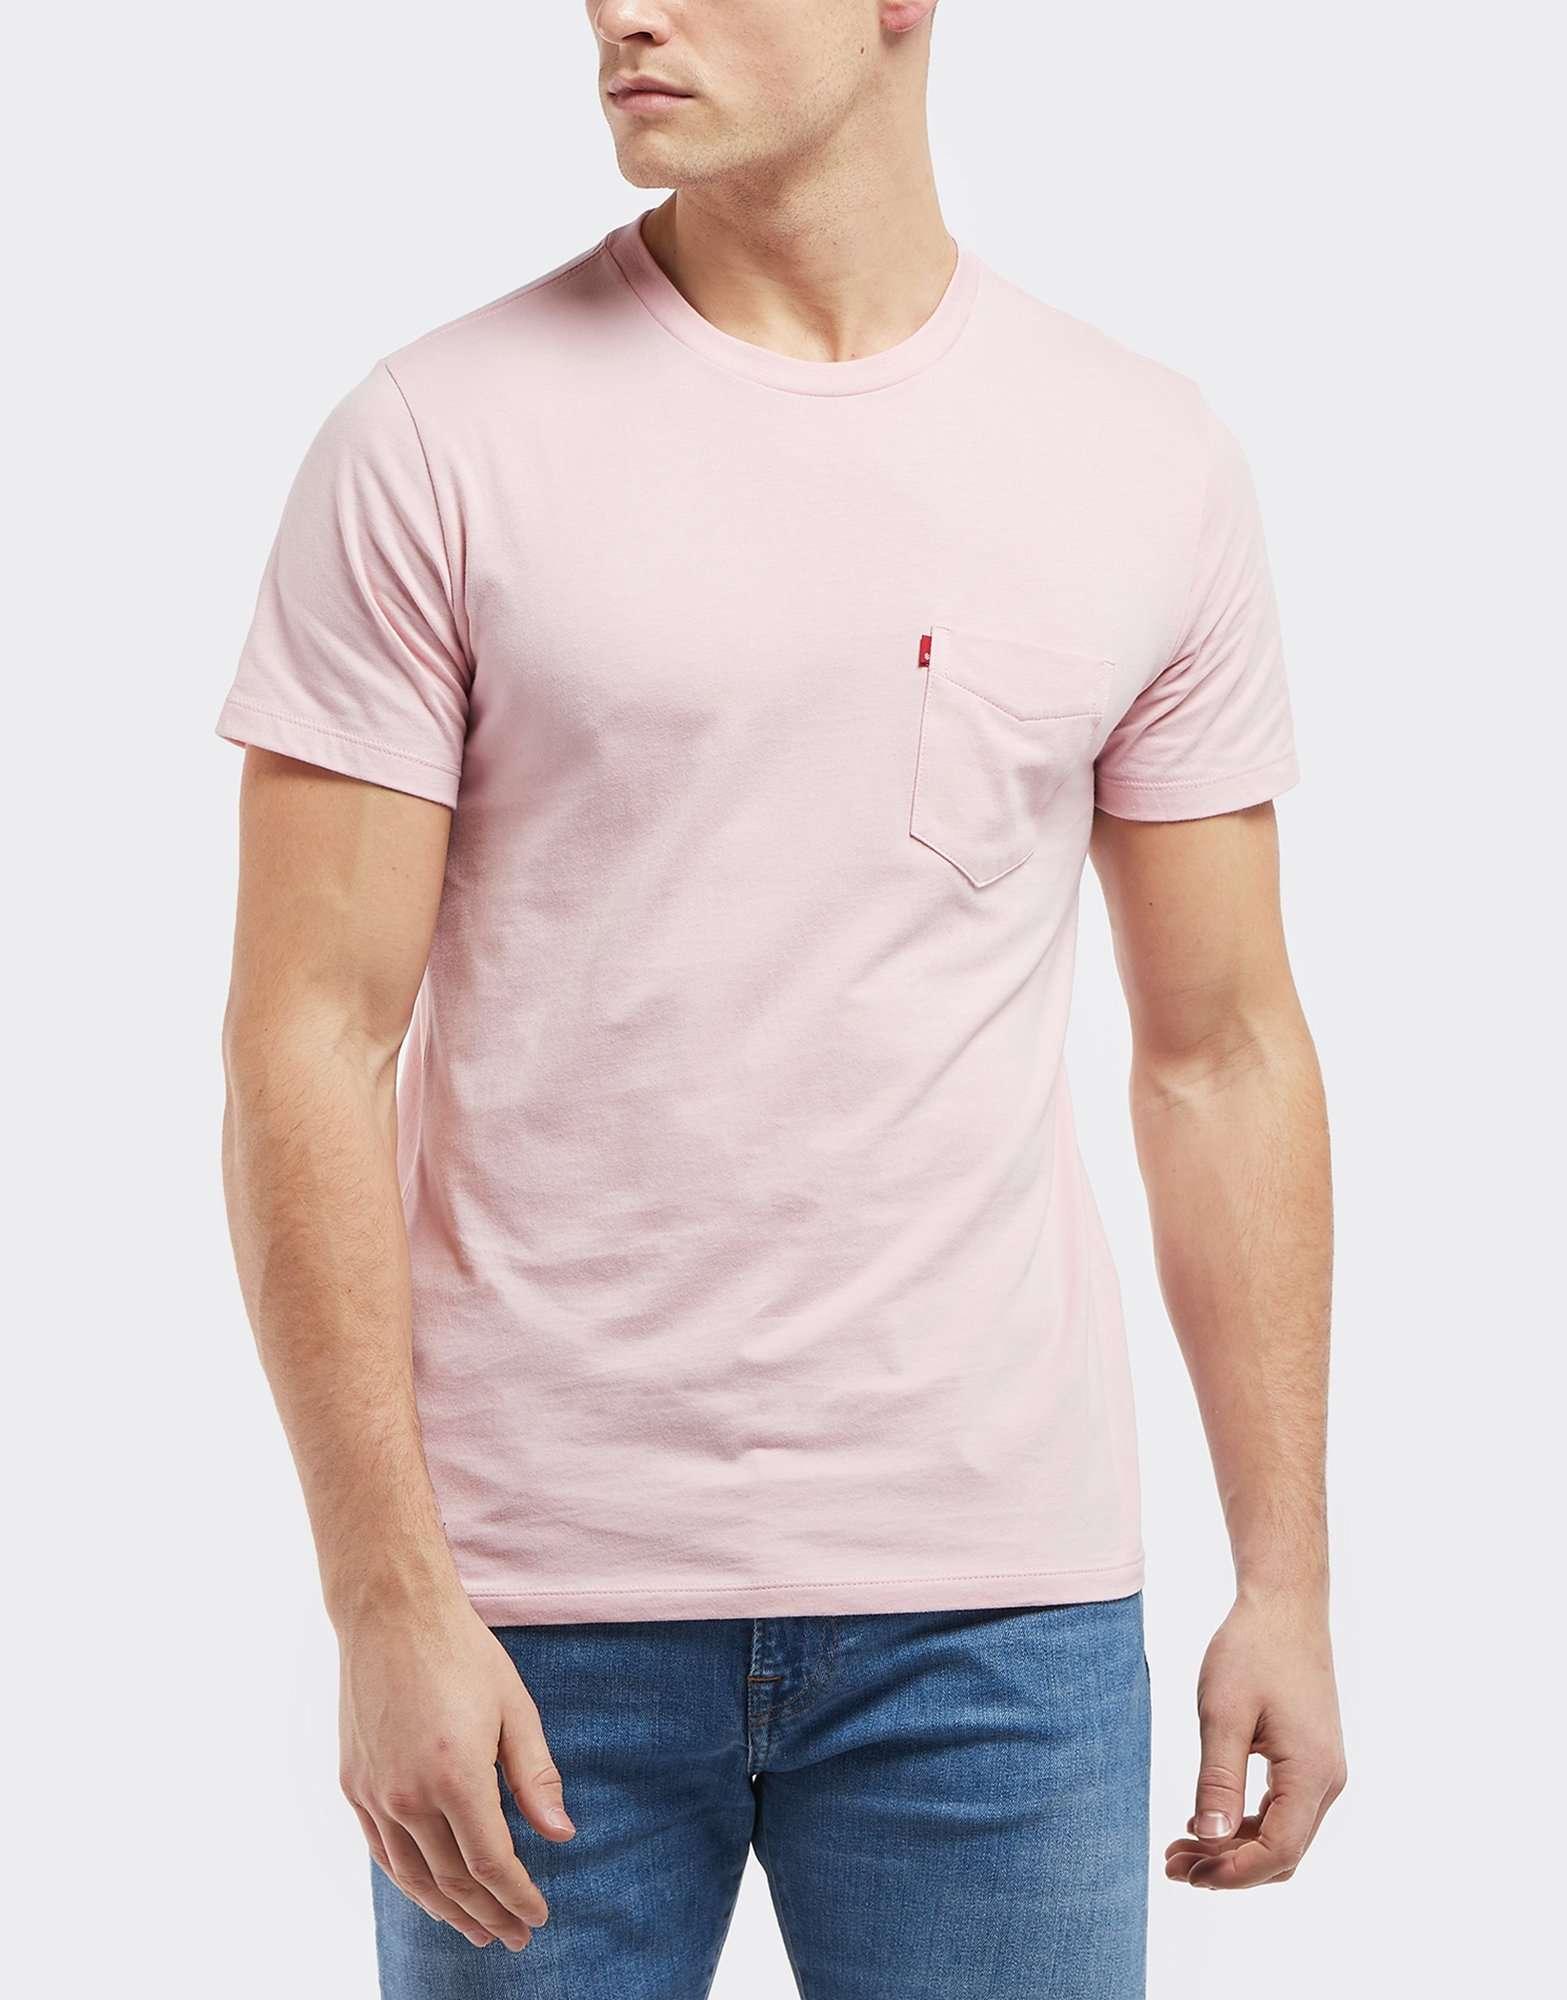 Levis Sunset Pocket Short Sleeve T-Shirt